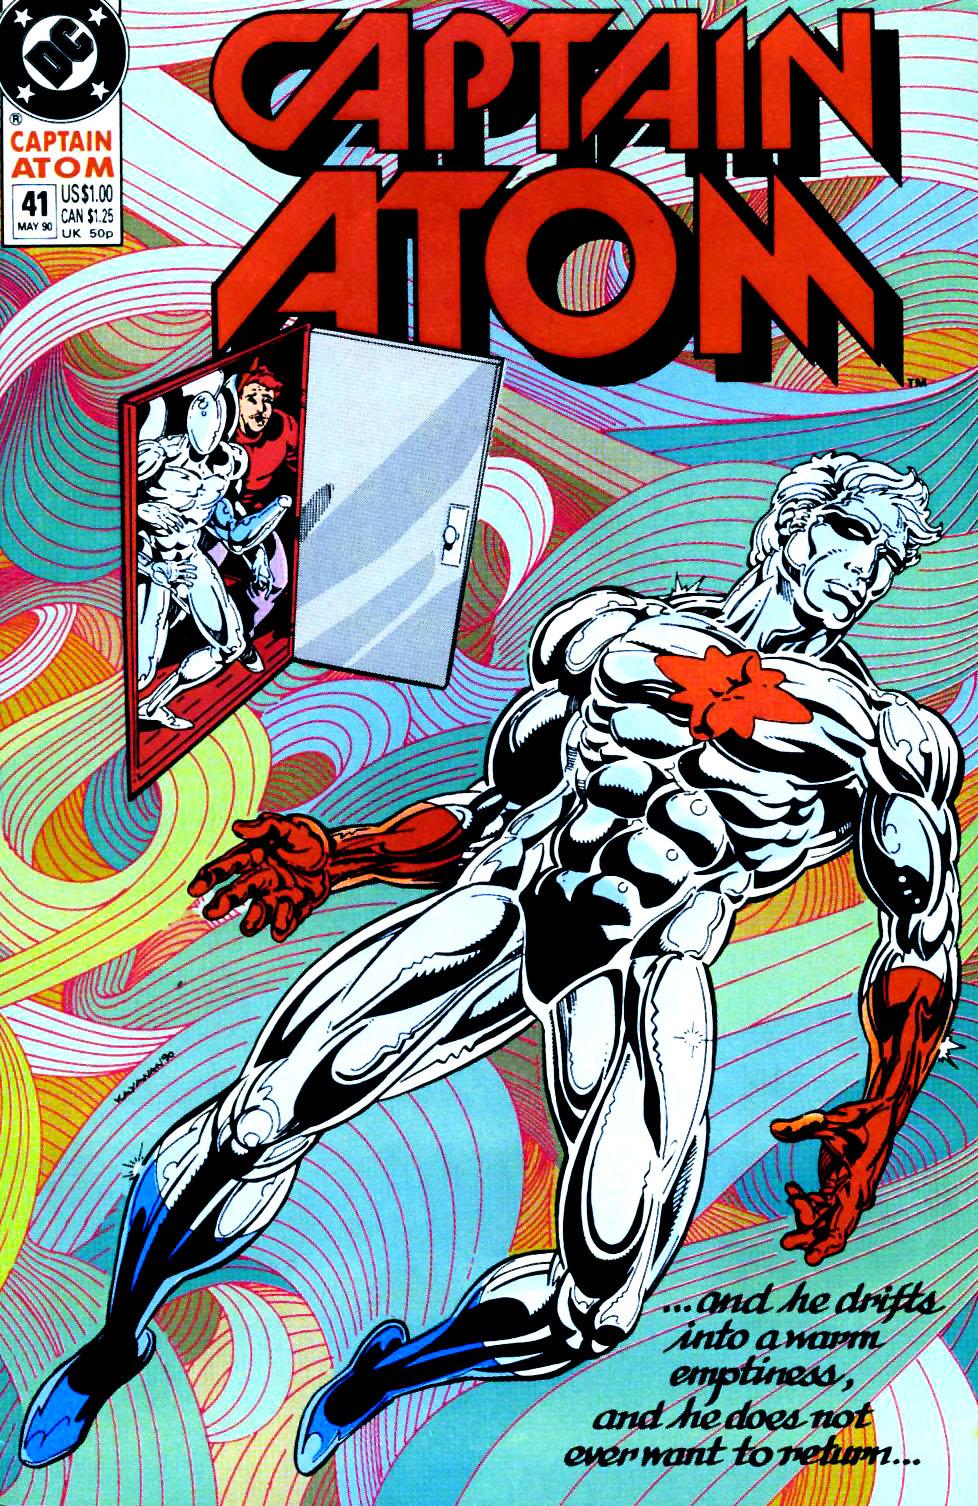 Captain Atom (1987) 41 Page 1